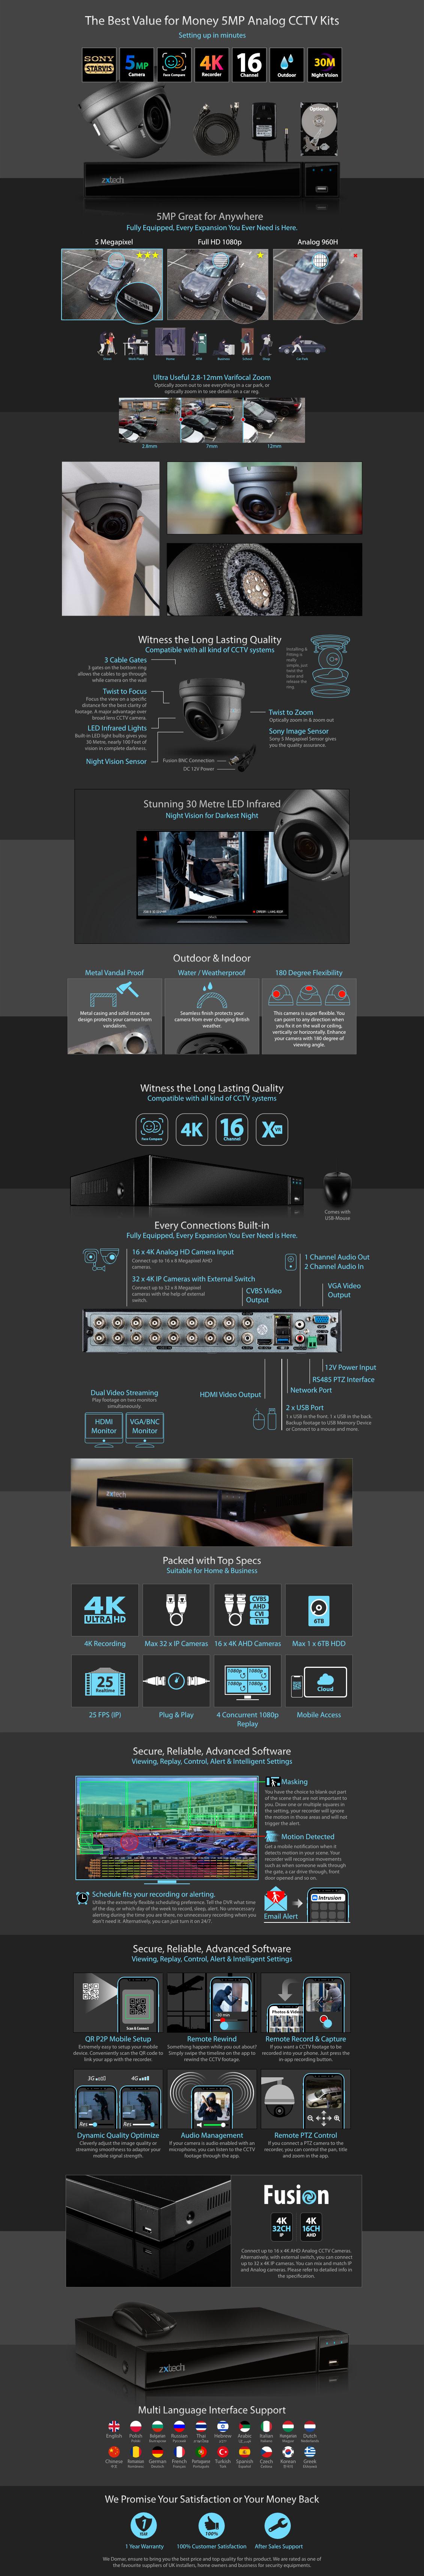 5MP AHD Camera System Digital Recorder HD Analog Camera Vandal-proof Zoom IR | AF14E16X